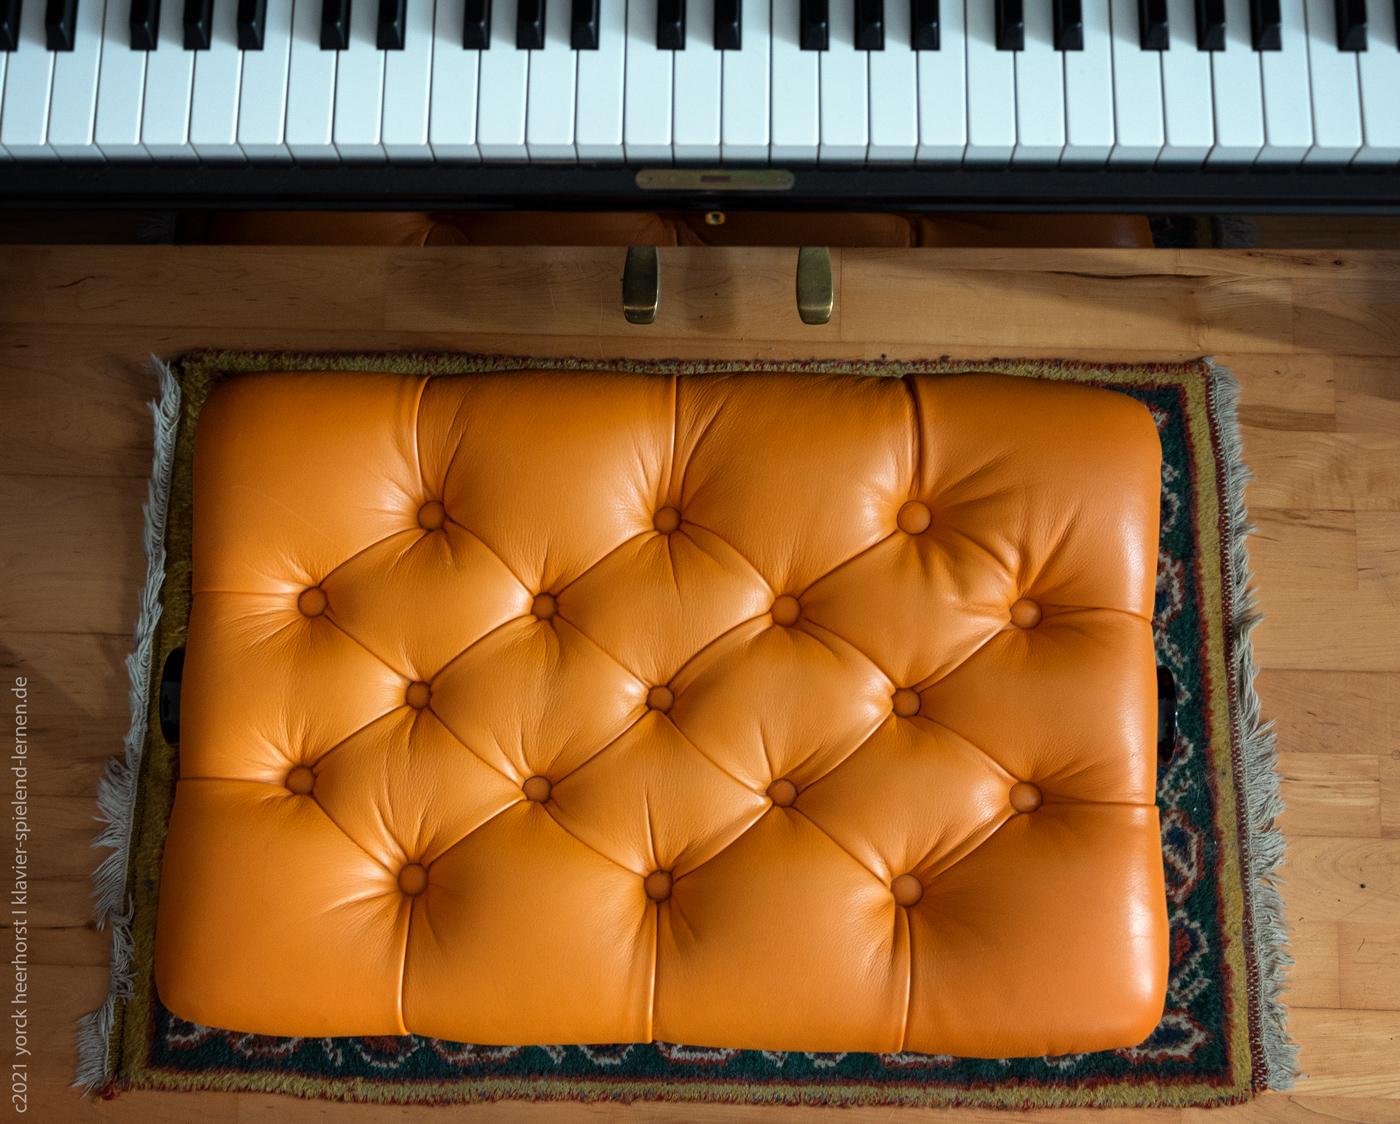 Klavierbank